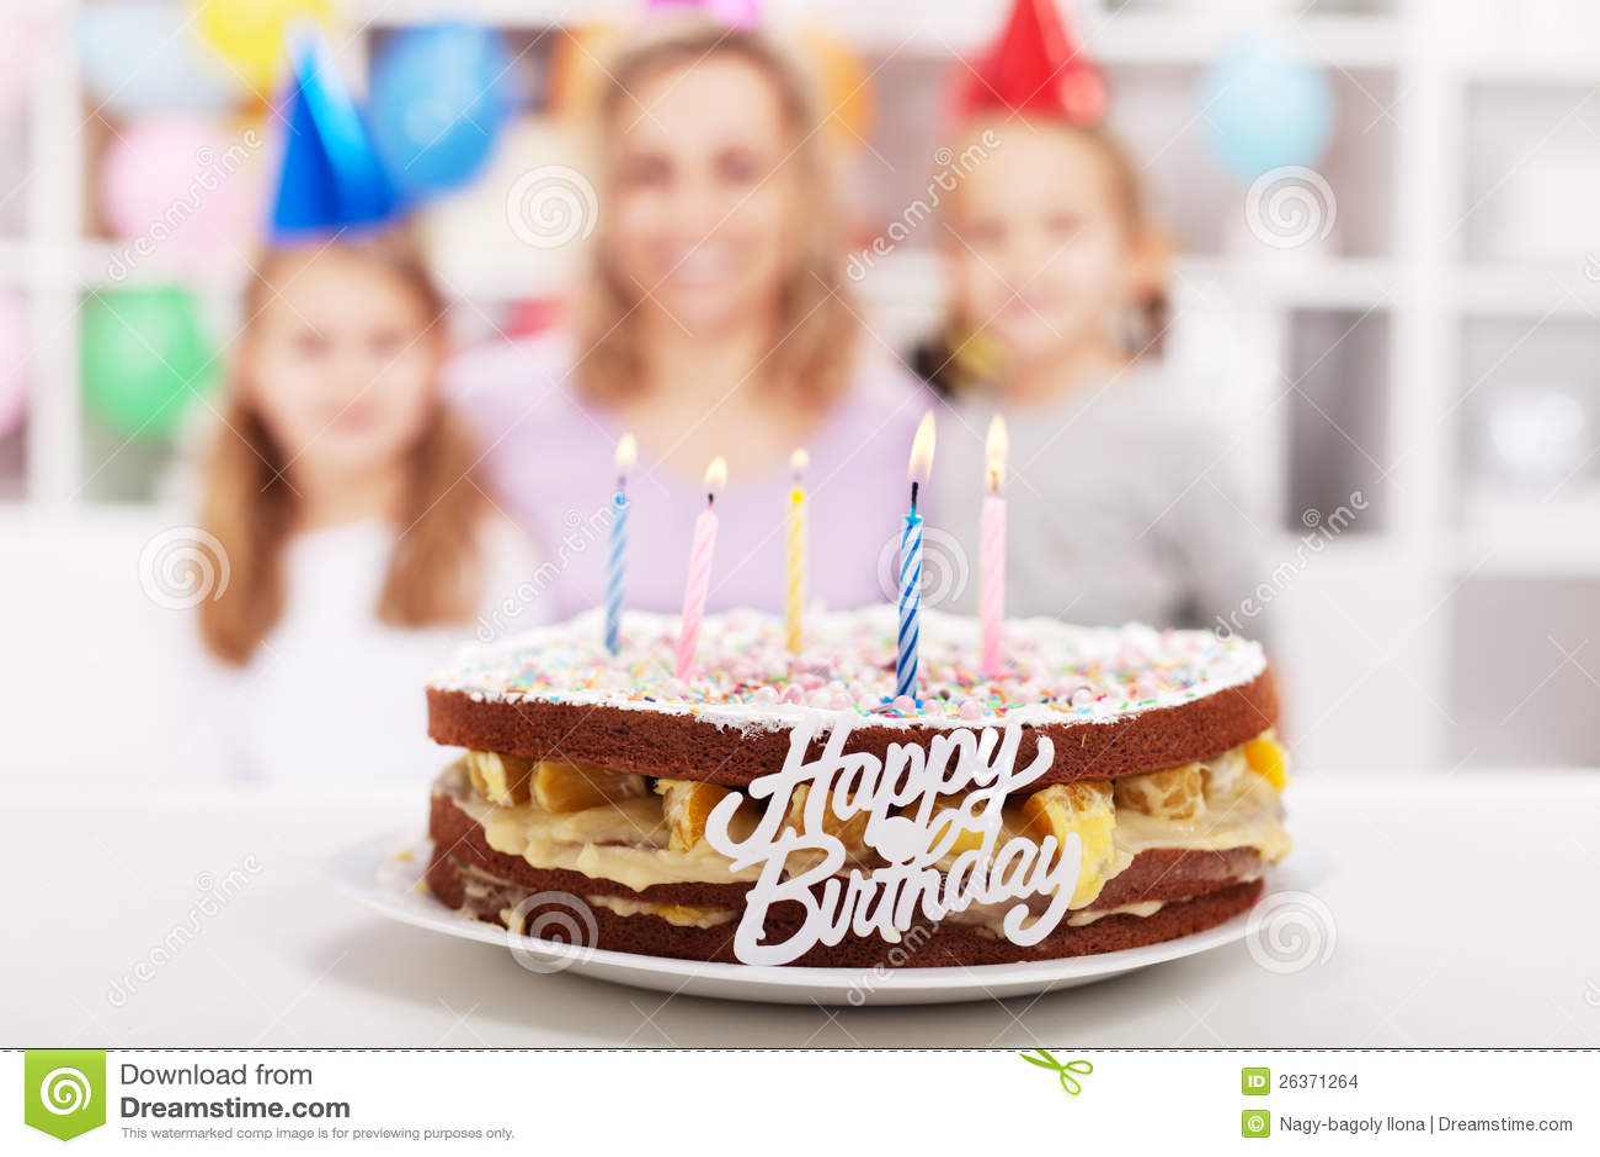 Home made happy birthday cake